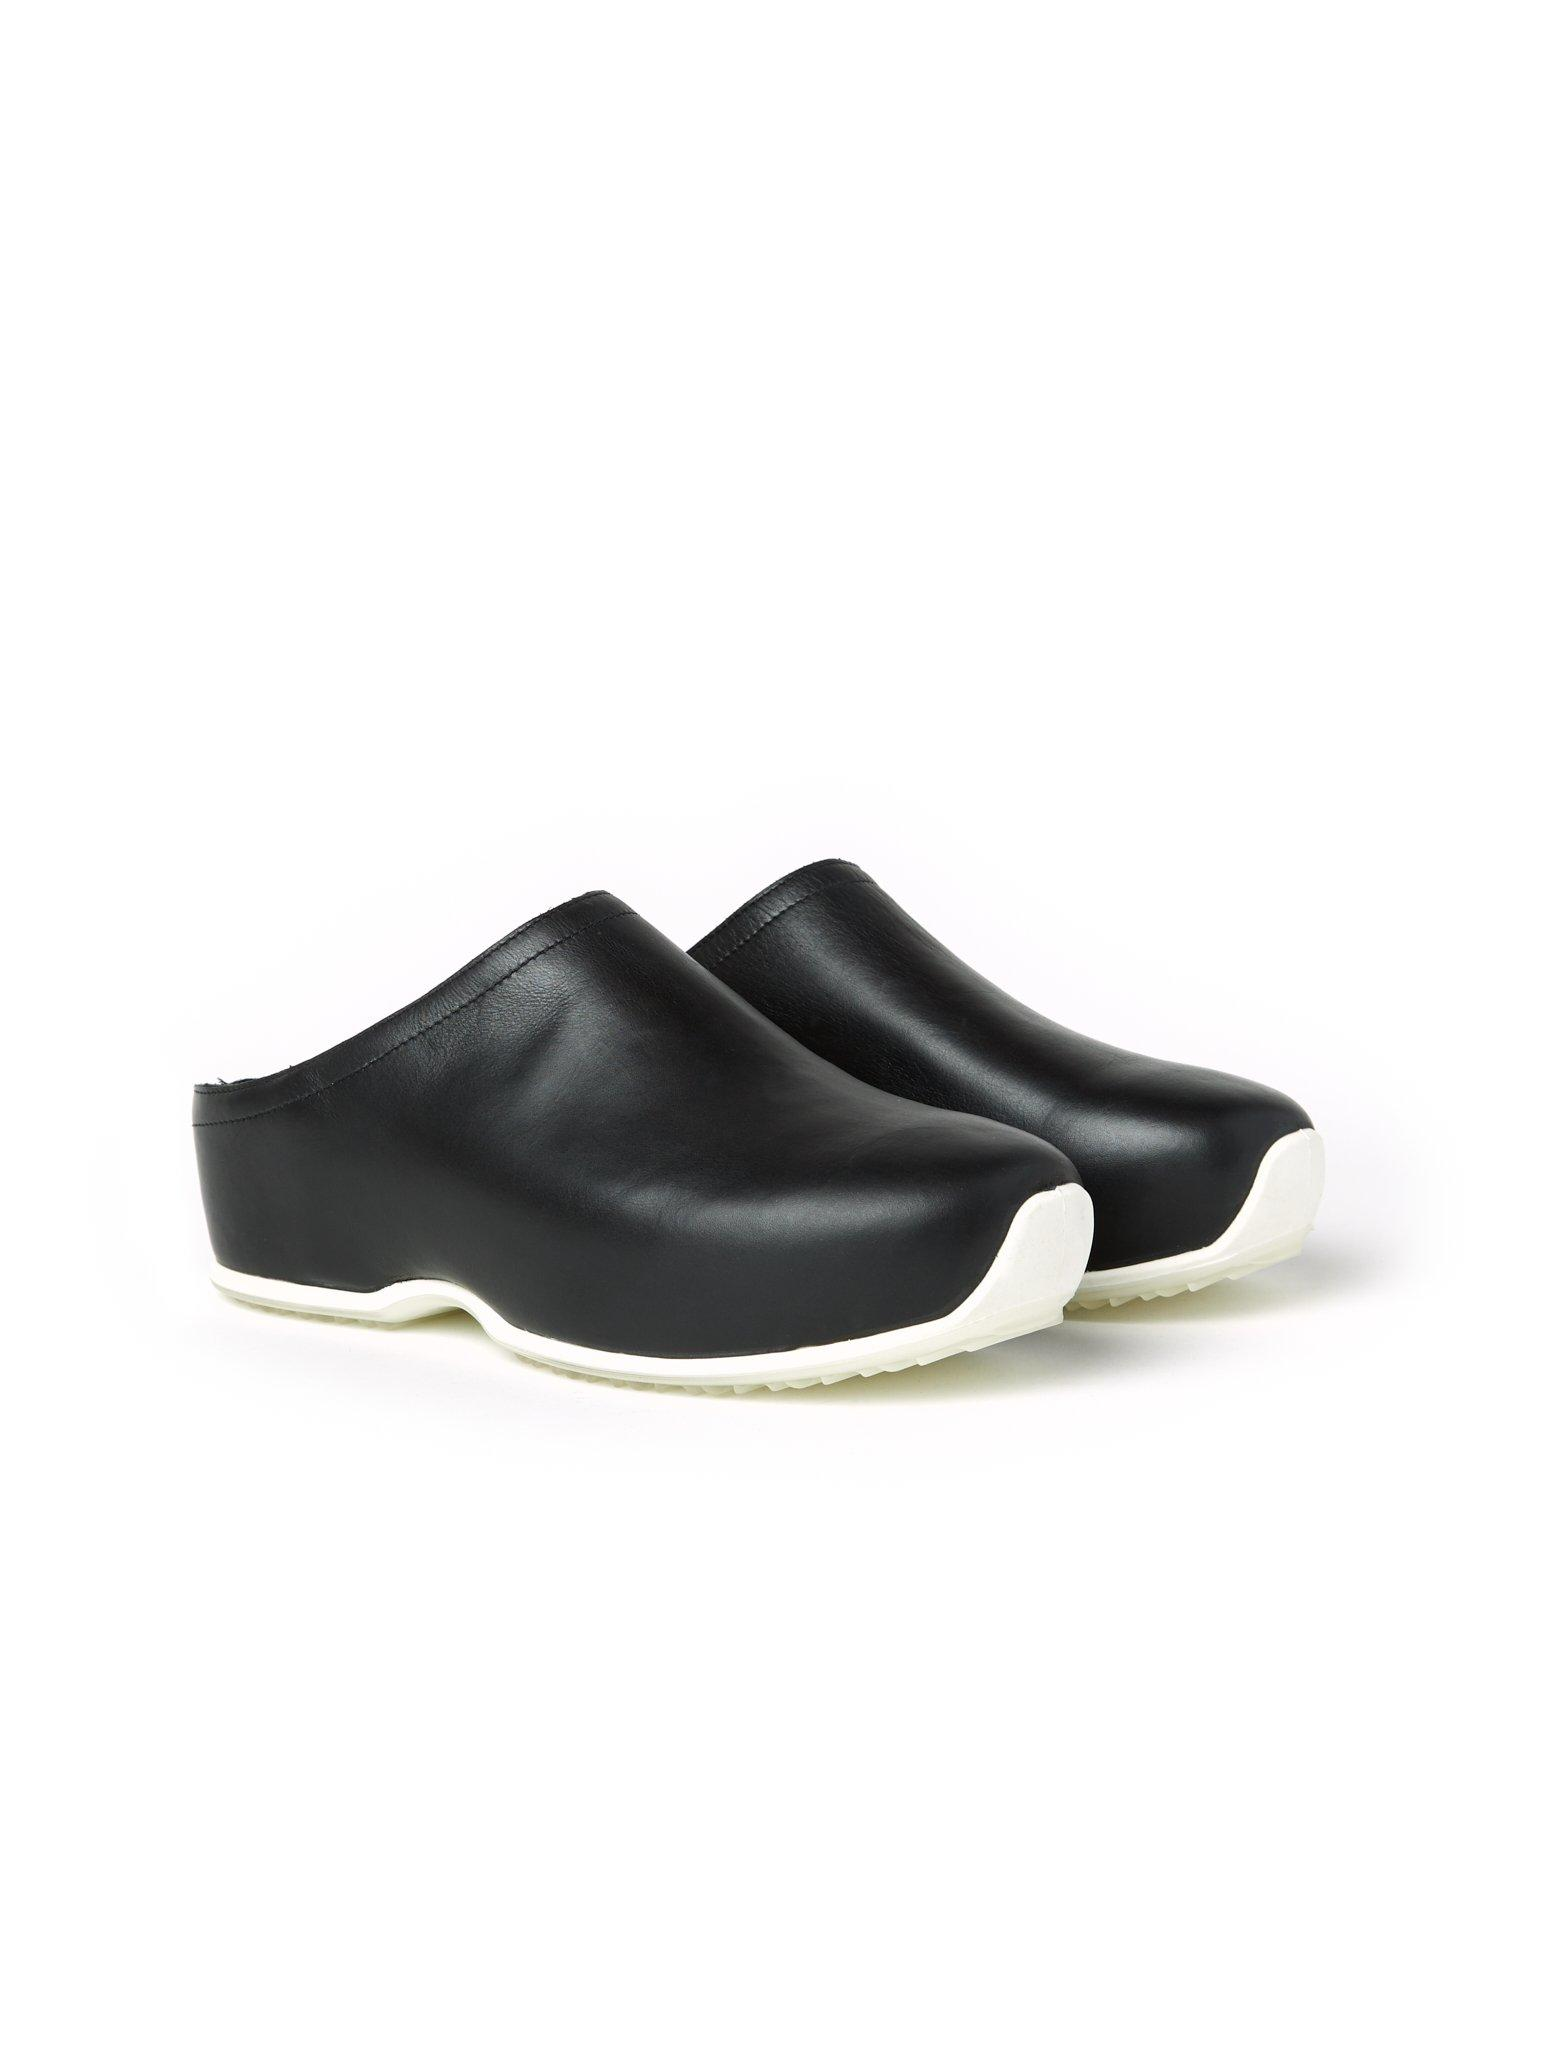 ecco clogs shoes